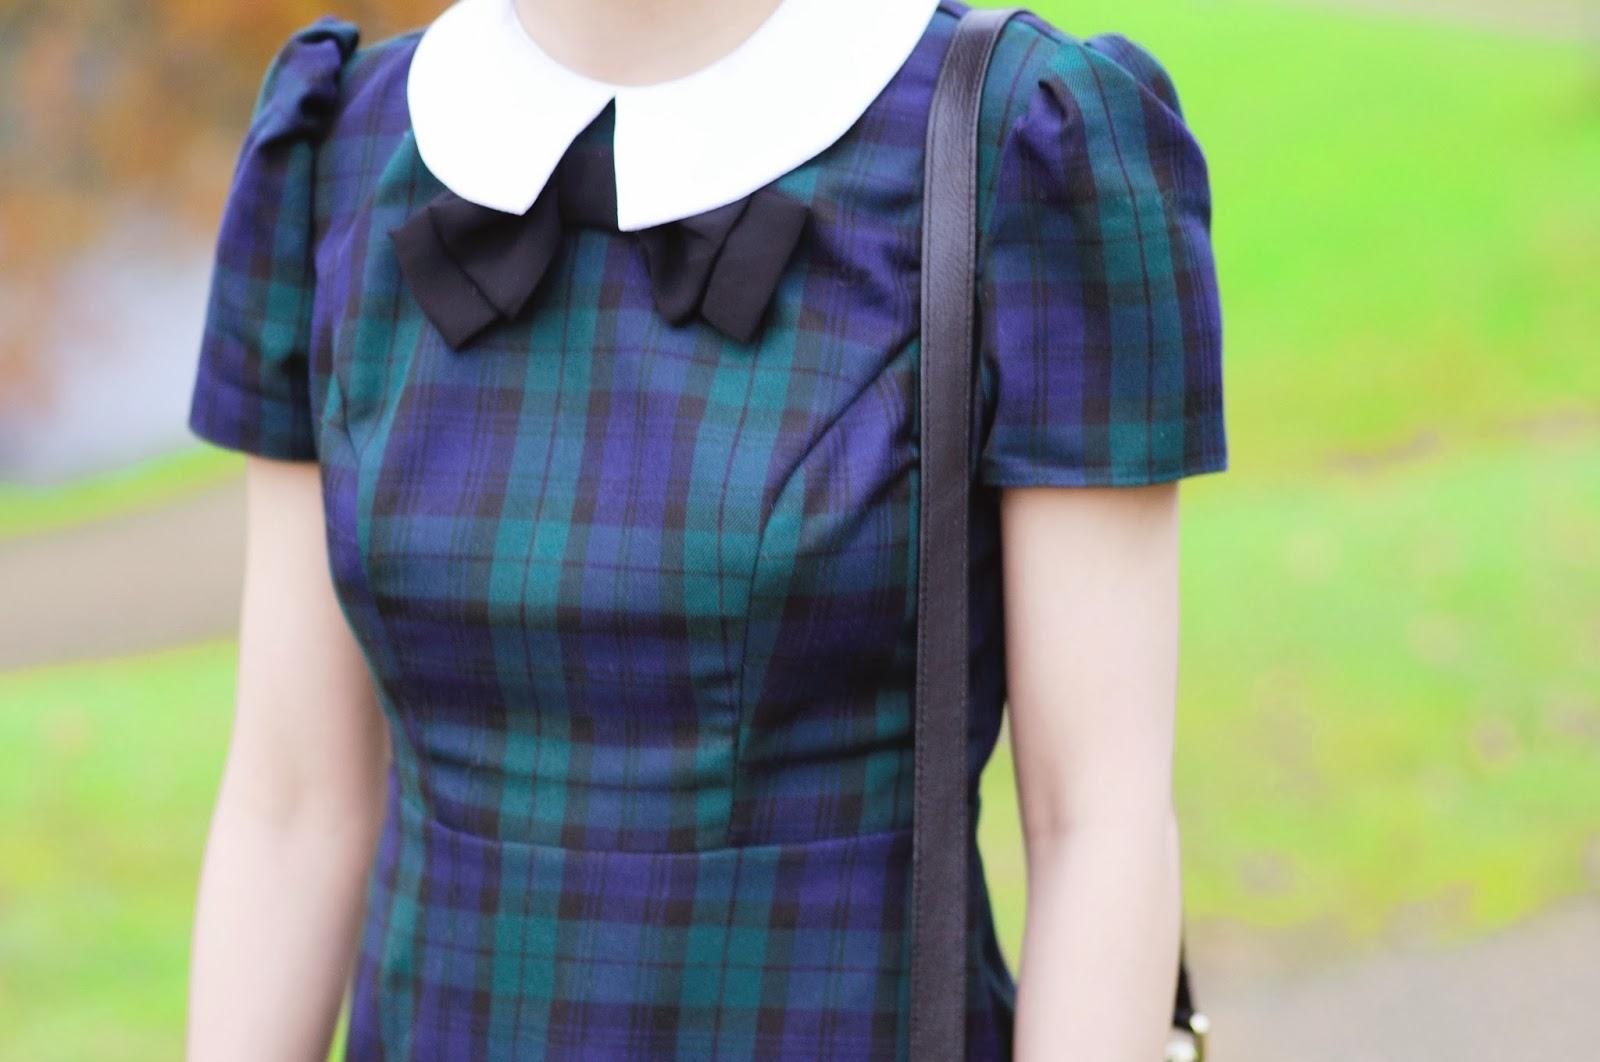 Tartan dress from Primark